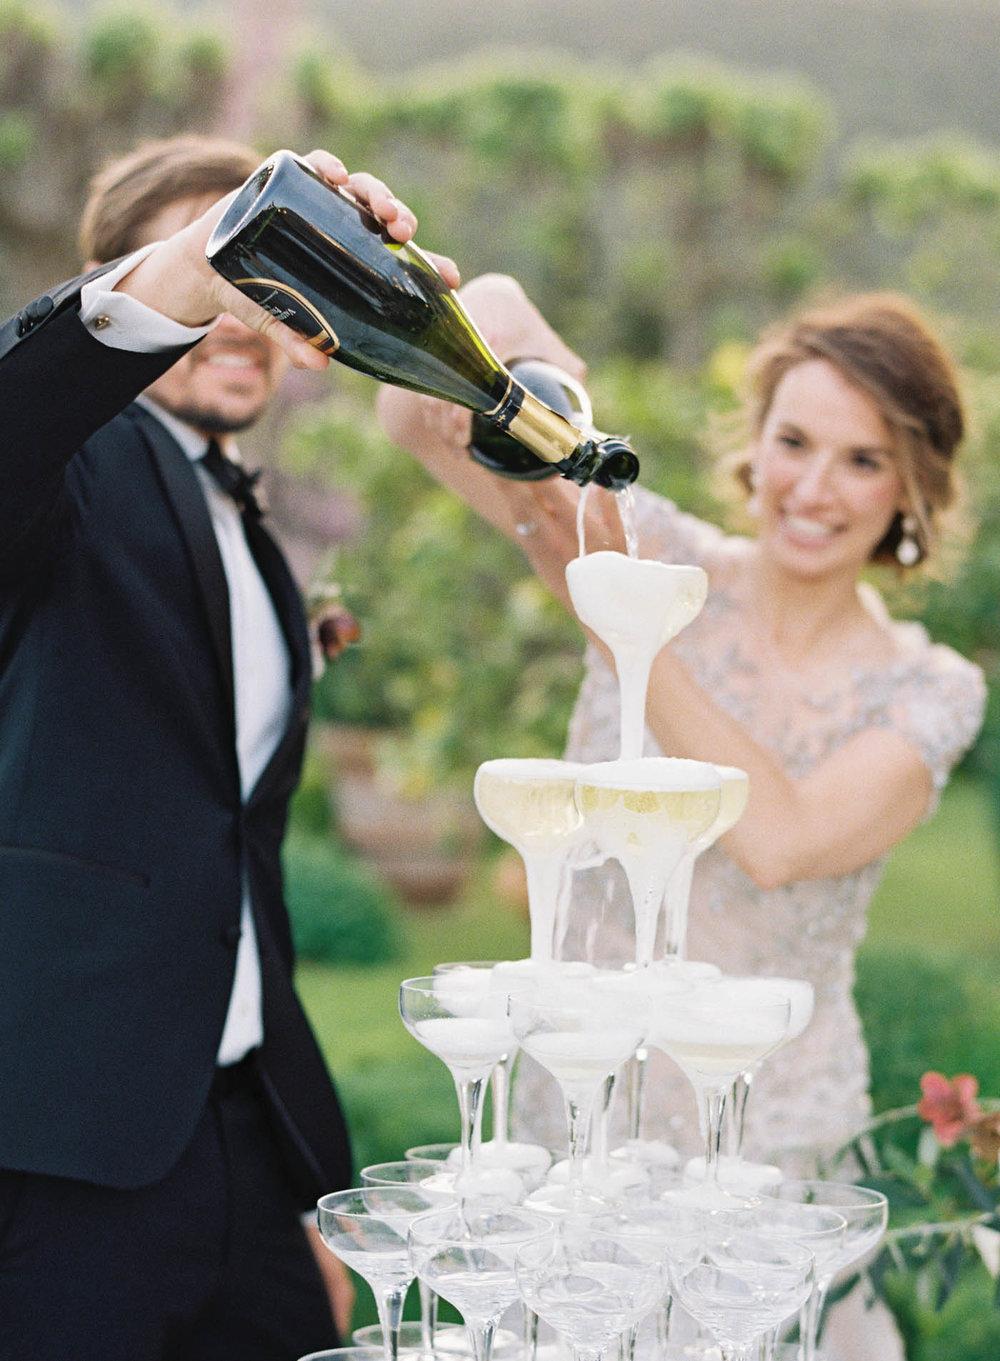 Villa_Cetinale_Wedding-53-Jen_Huang-ElanJacob-320-Jen_Huang-007326-R1-004.jpg